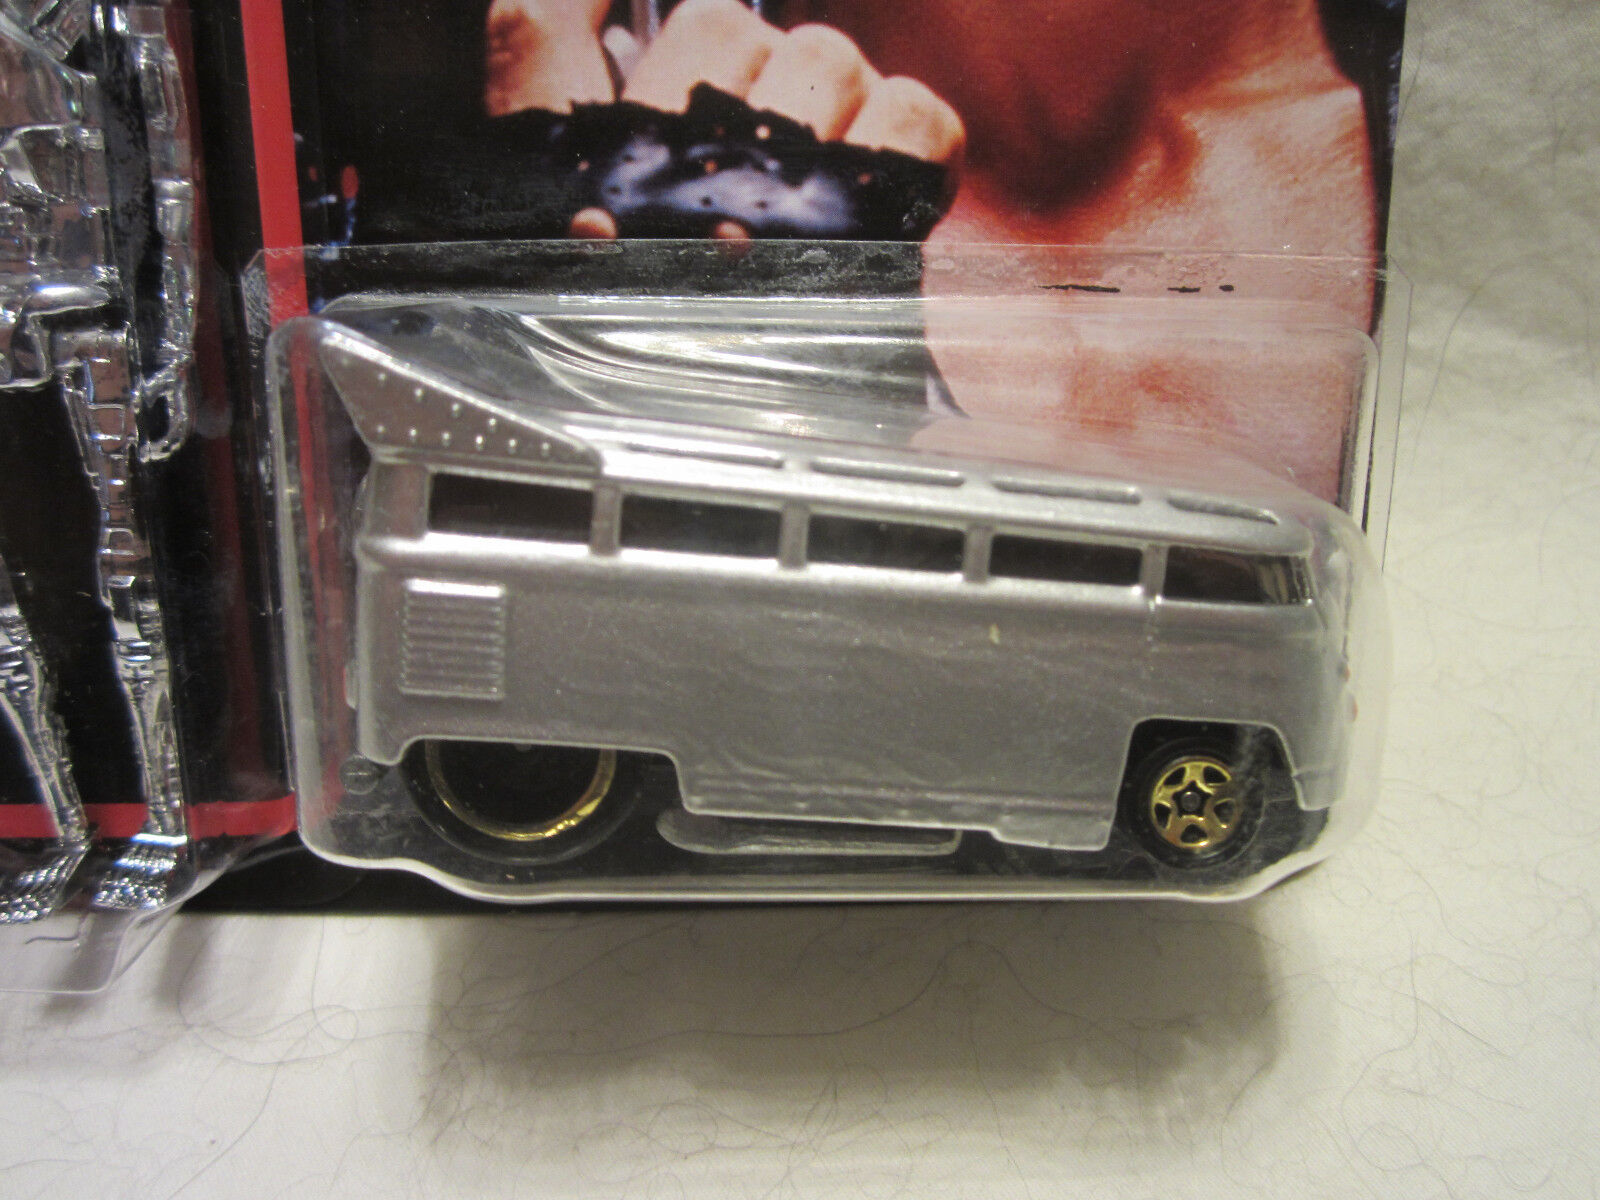 Hot Wheels Personnalisé Volkswagen Drag Bus le Terminator Terminator Terminator Édition Limitée a9f1c3